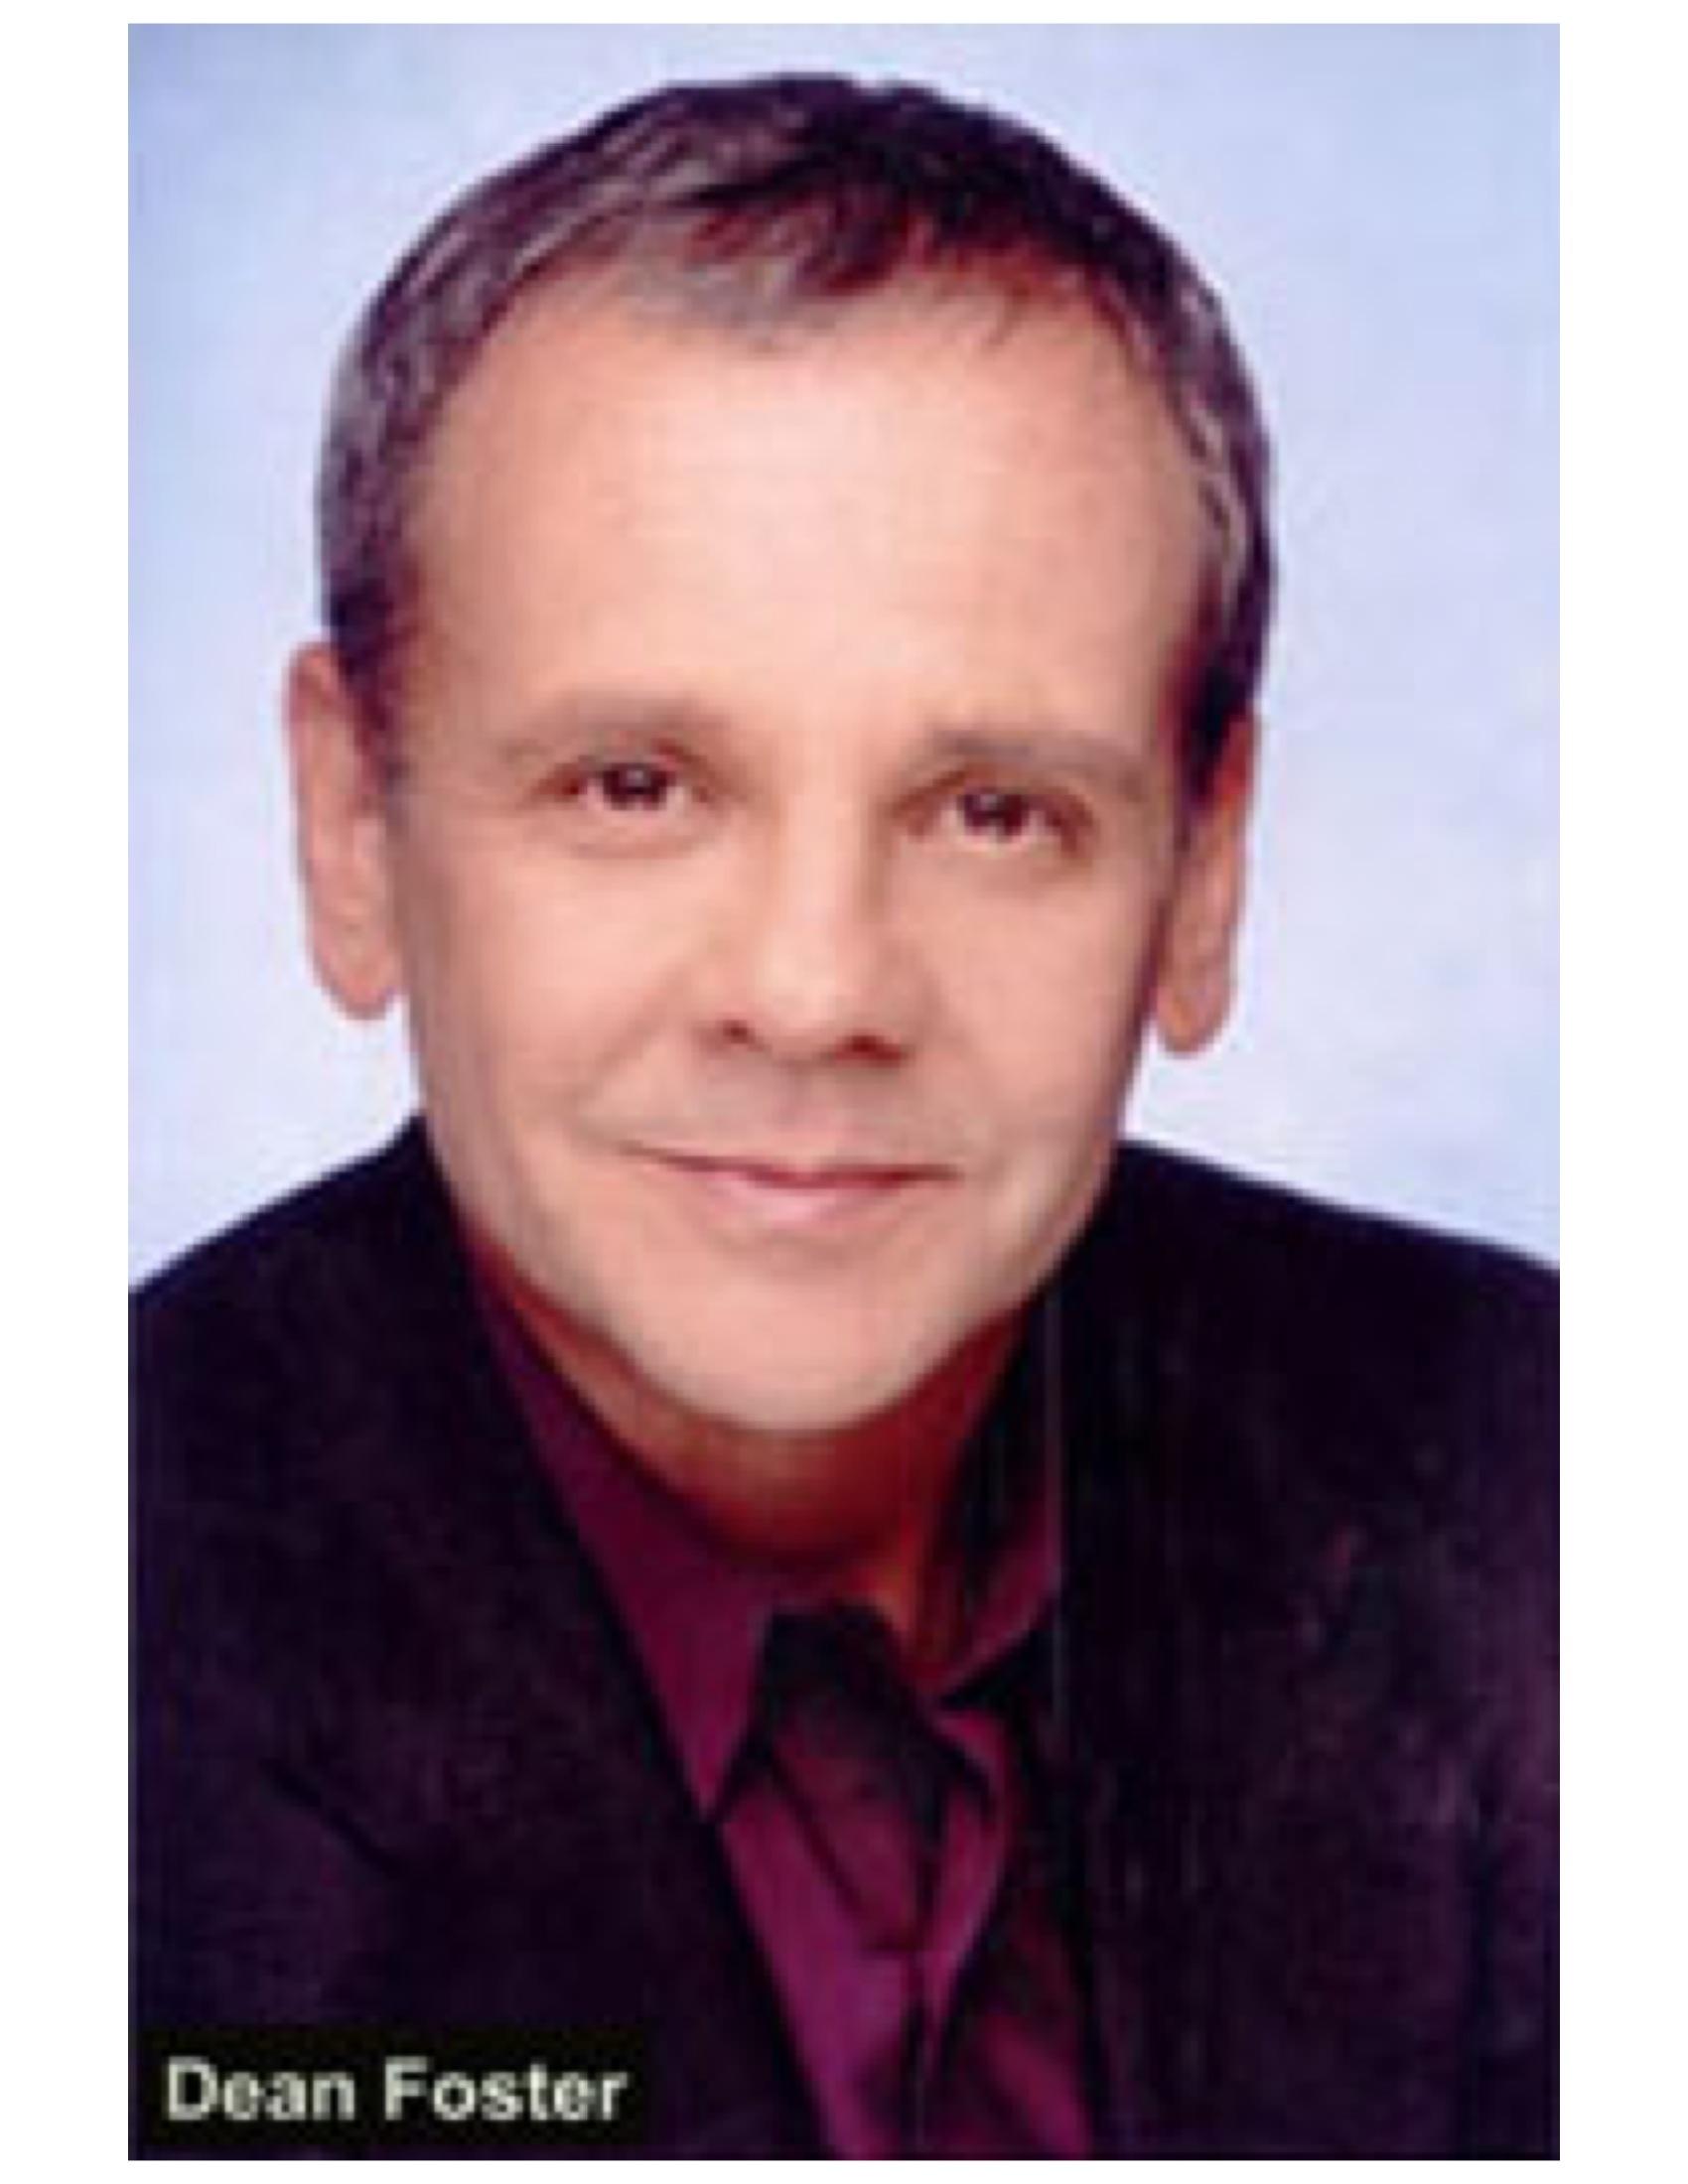 Dean Foster